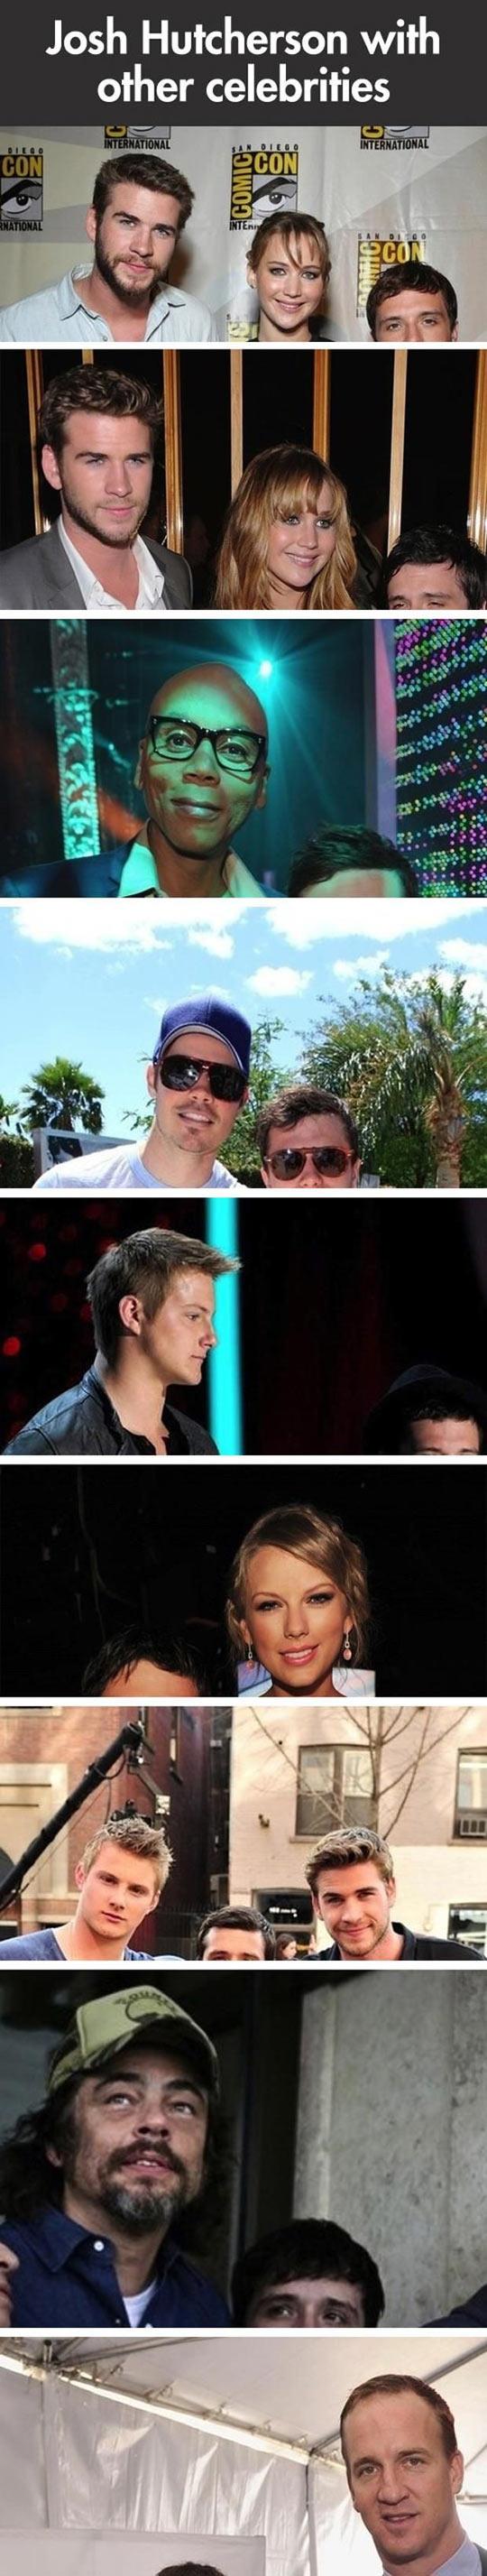 funny-Josh-Hutcherson-short-celebrities